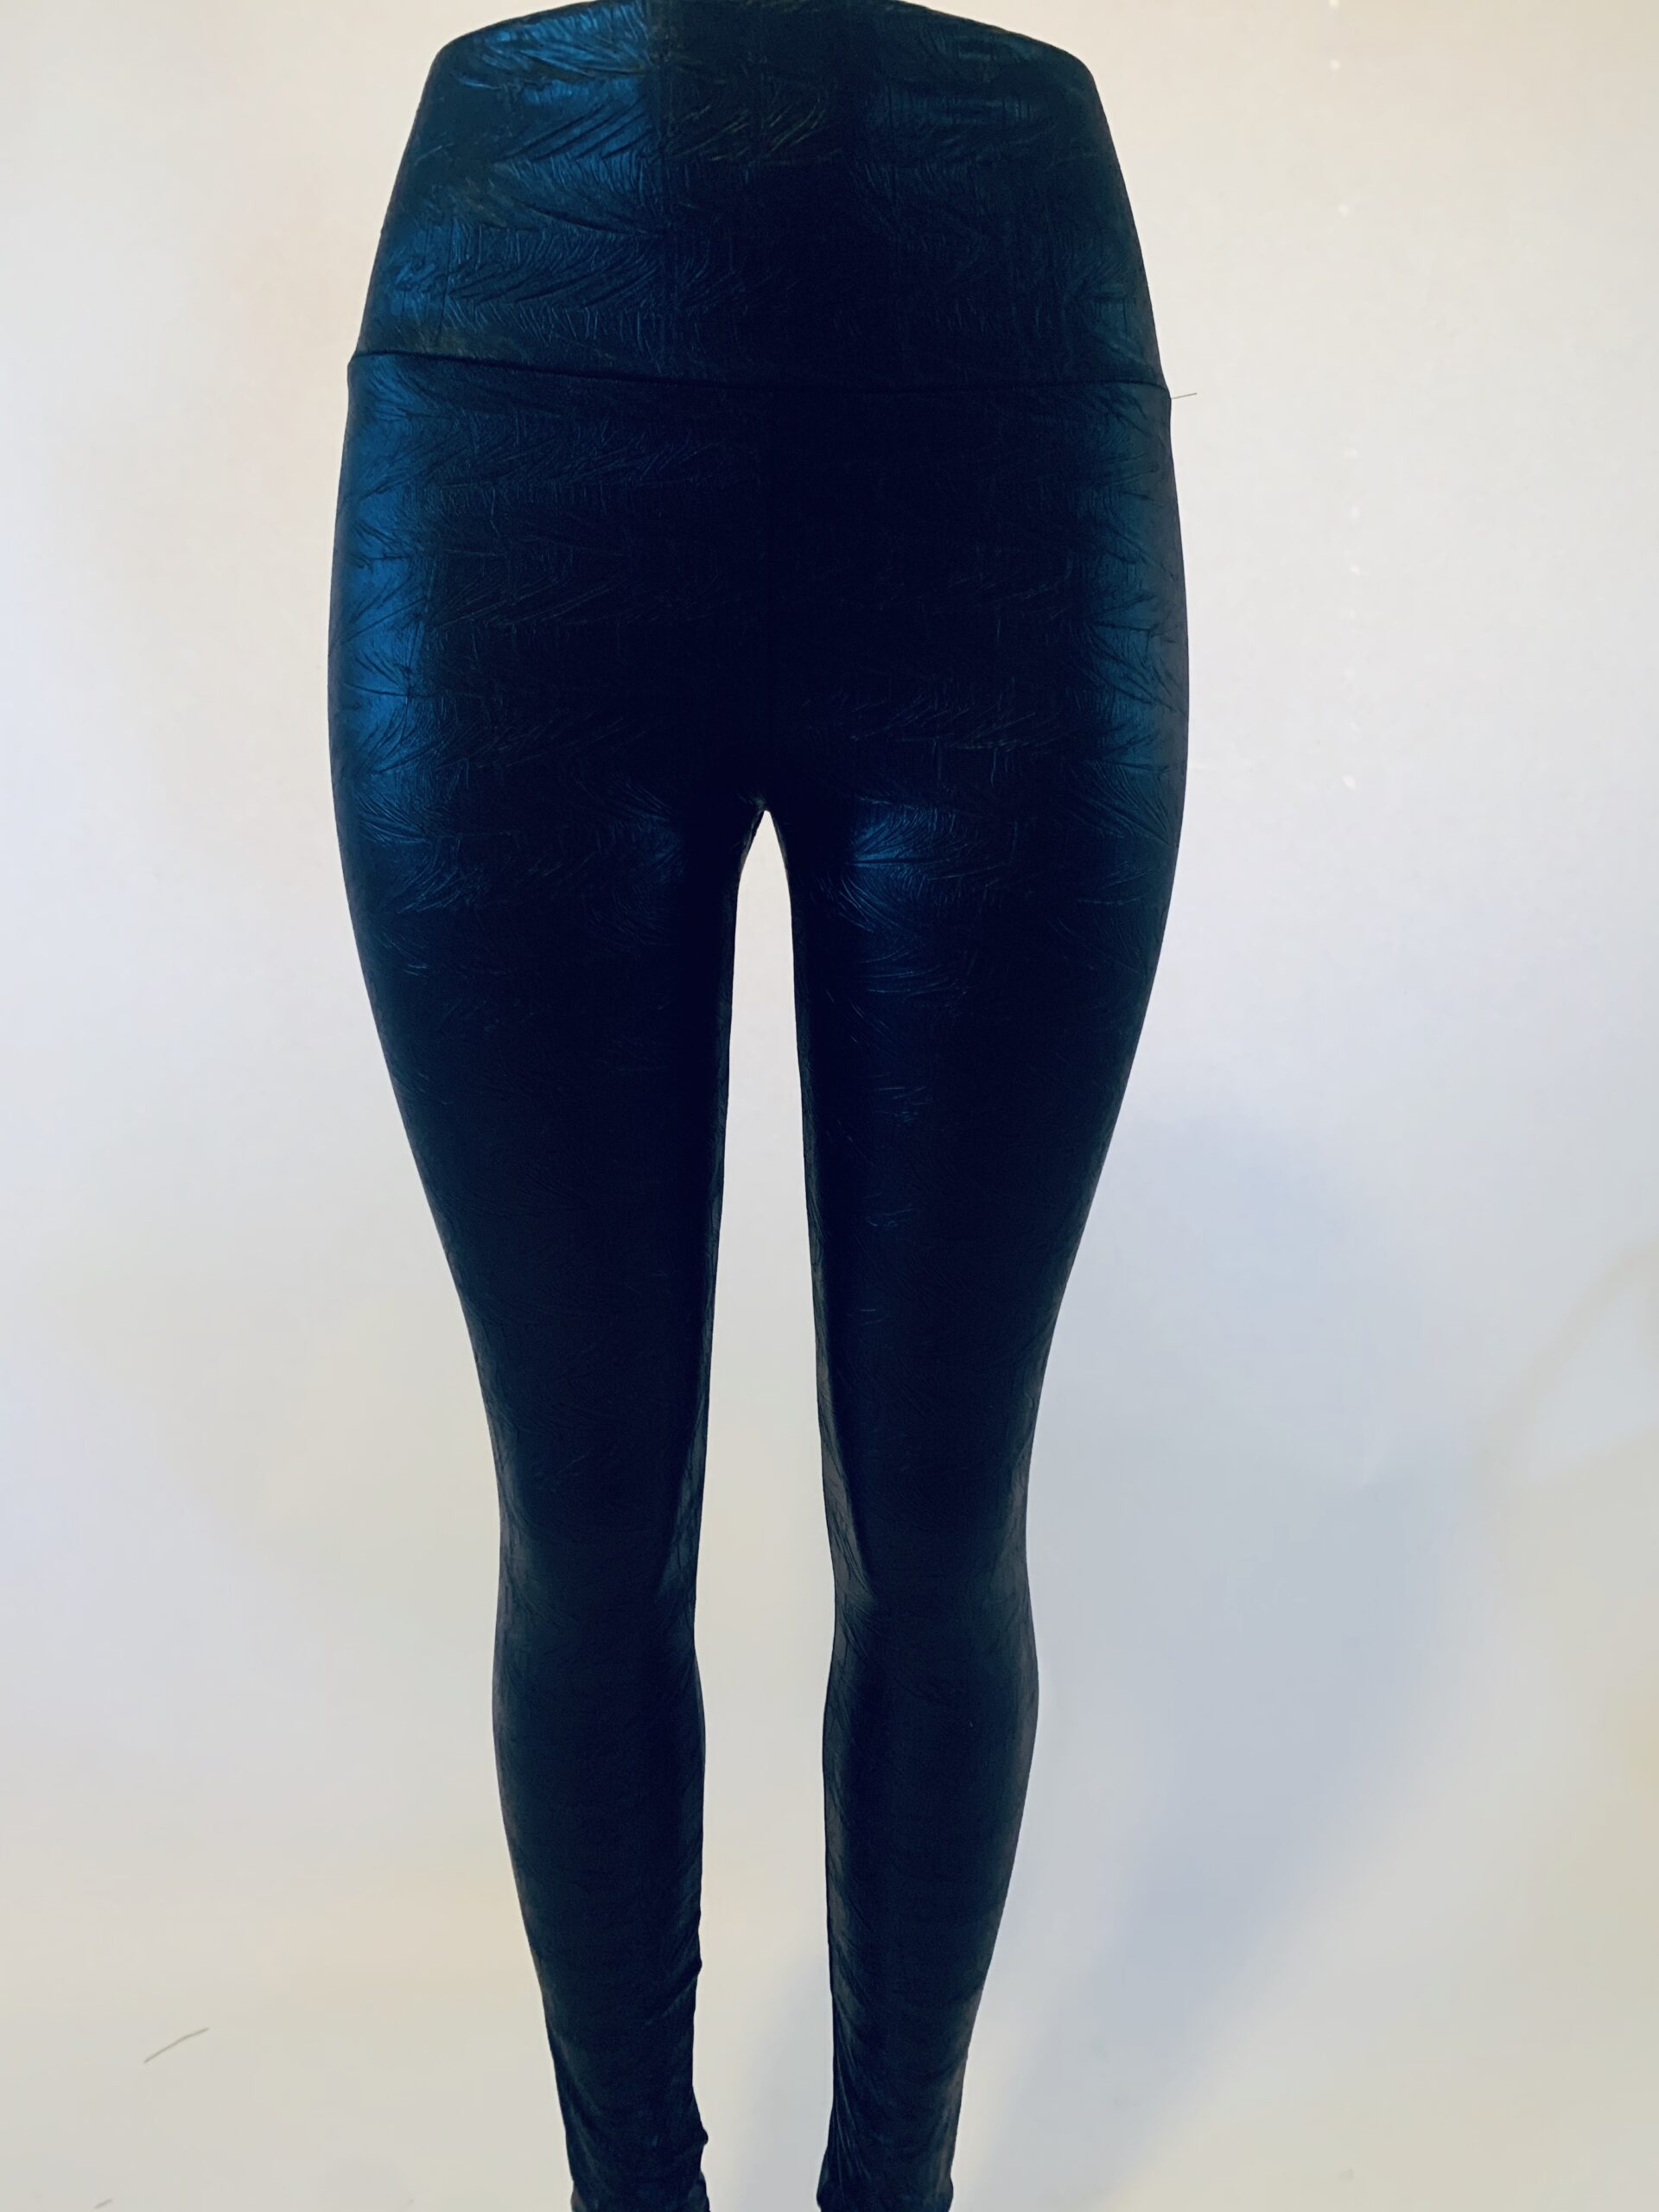 Black Pleather High-Waisted Legging